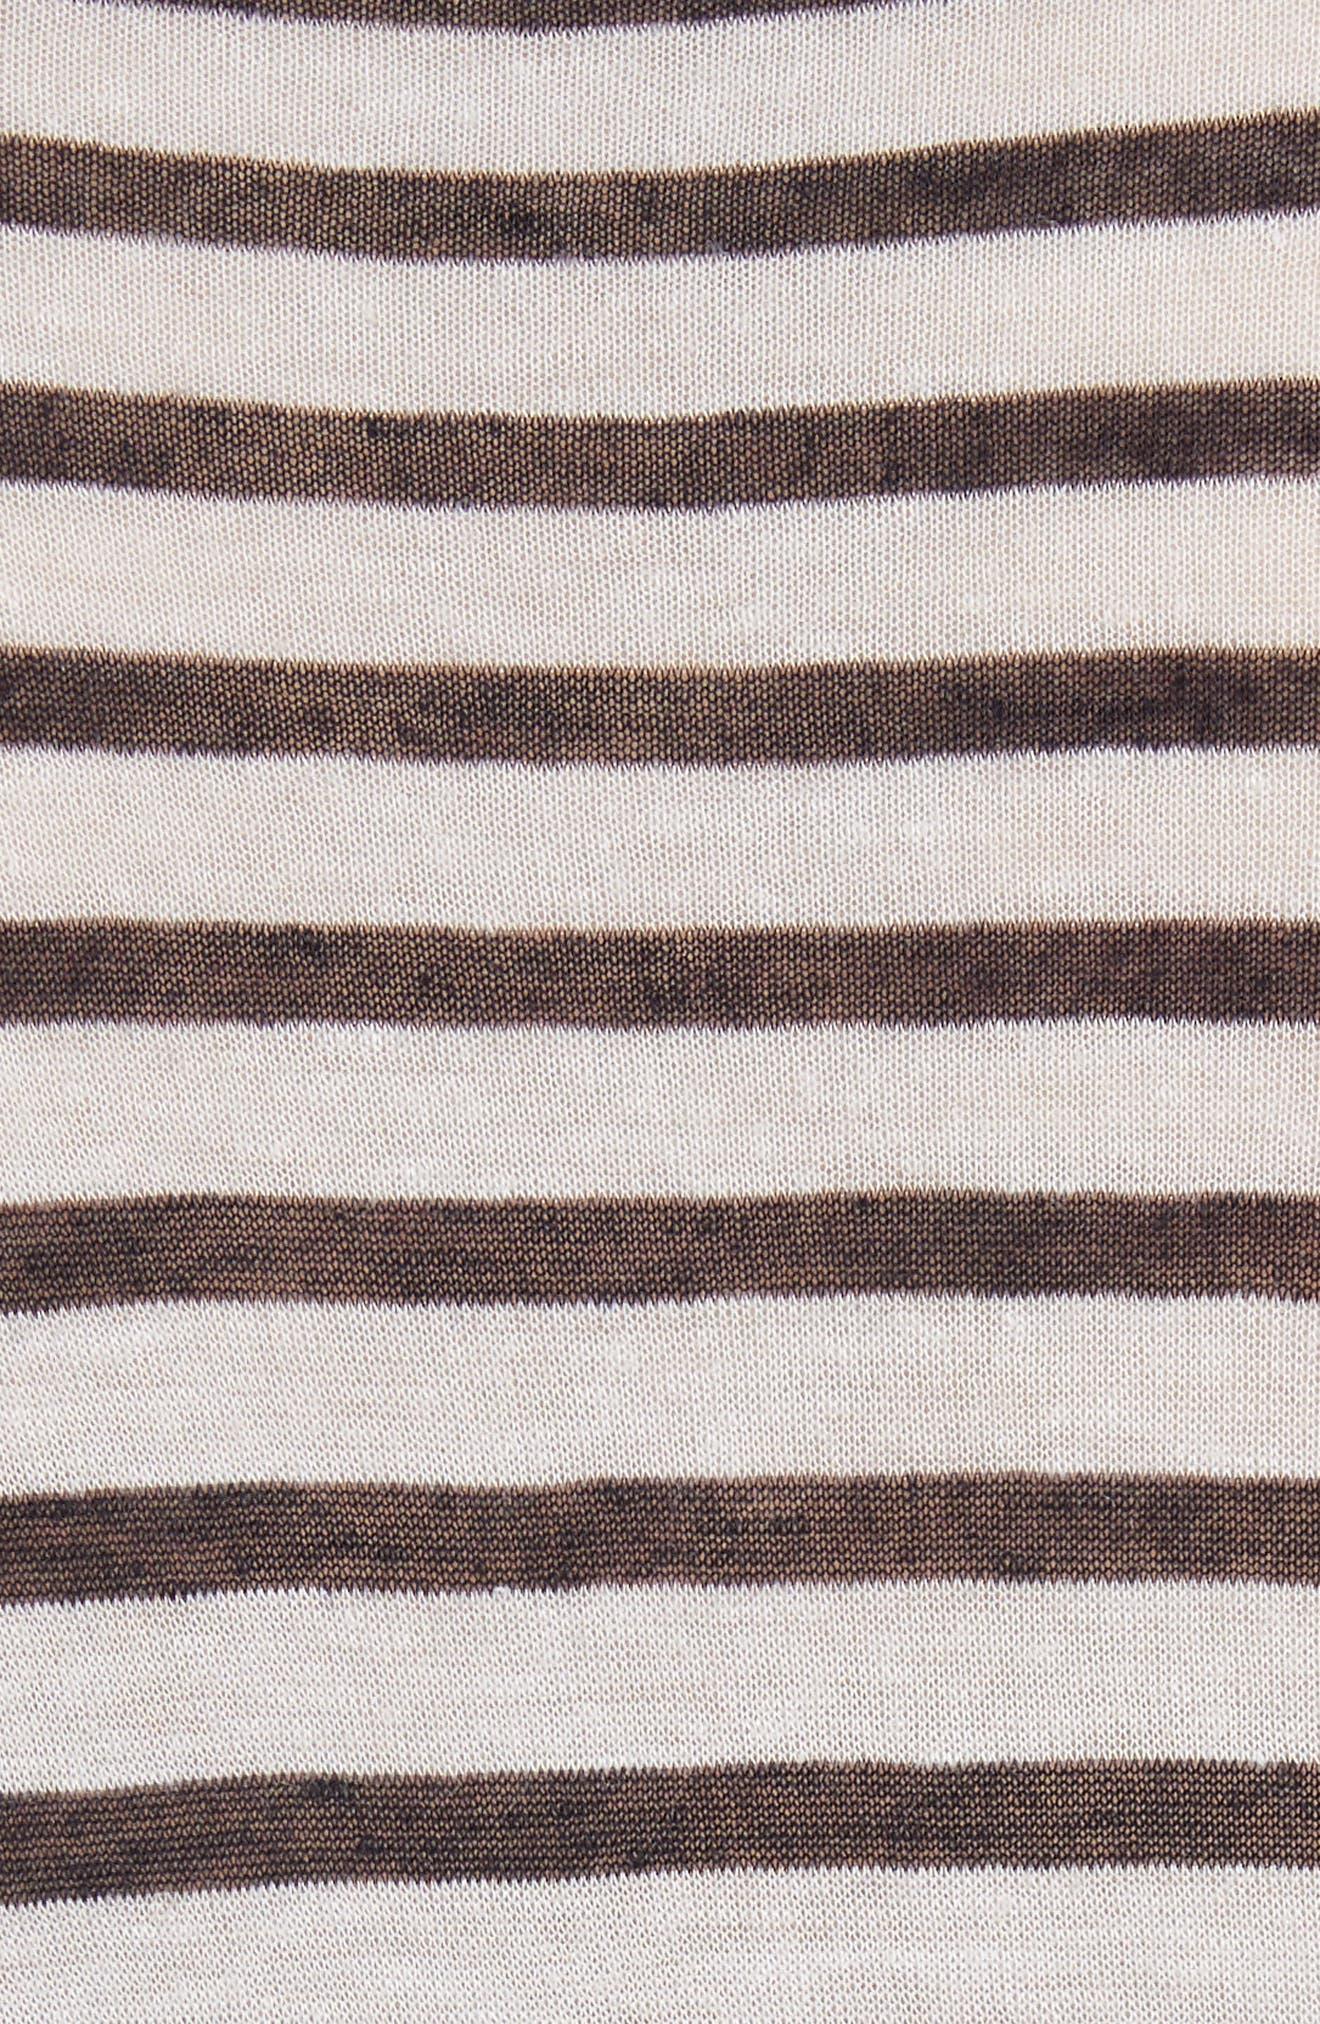 Side Tie Stripe Slub Jersey Tee,                             Alternate thumbnail 4, color,                             Ink/ Ivory